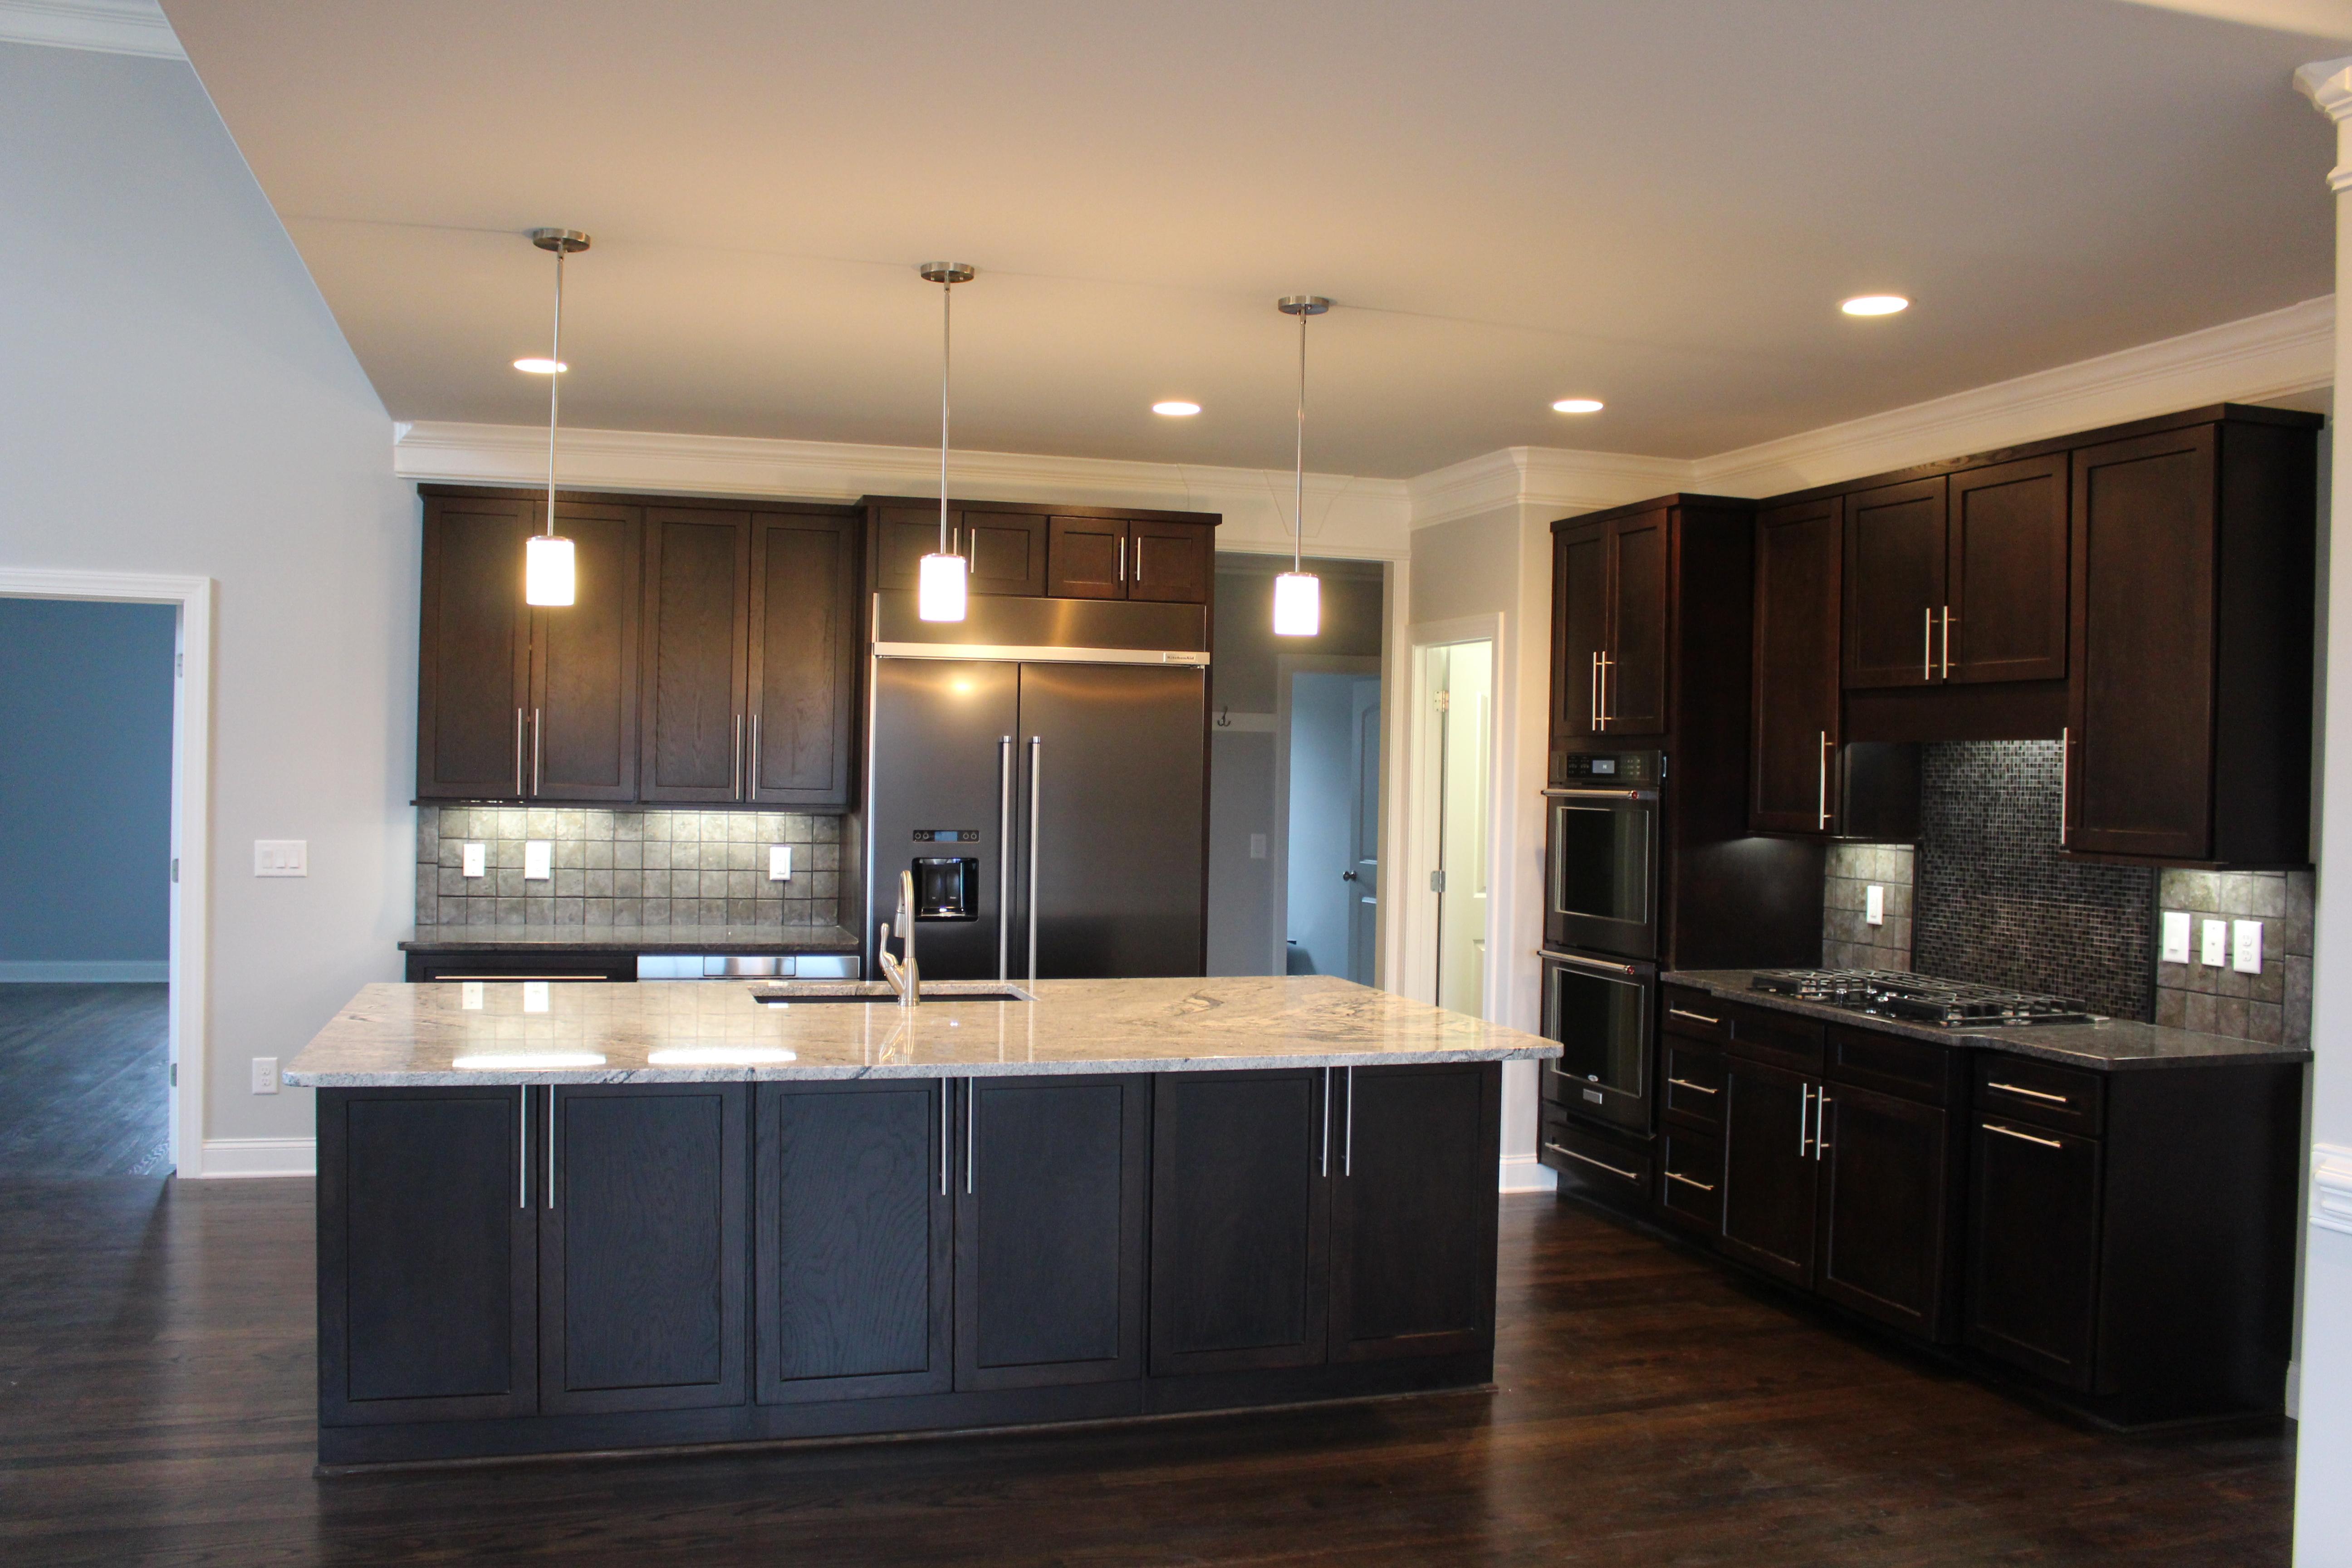 Lot 202 AB kitchen1